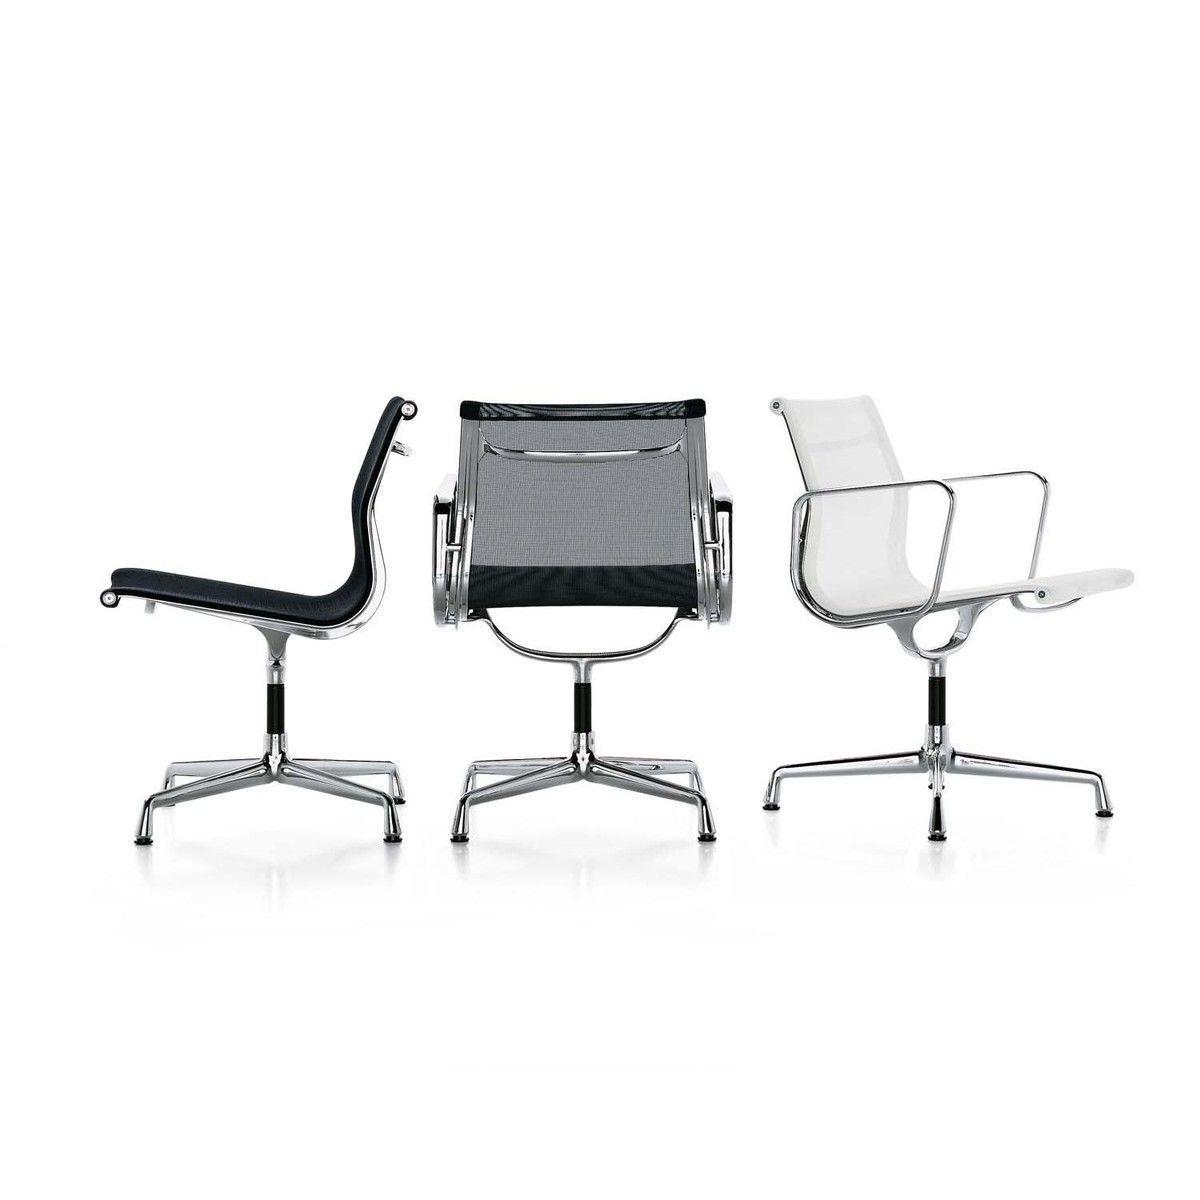 Vitra ea 108 aluminium chair chaise de bureau vitra for Vitra soldes